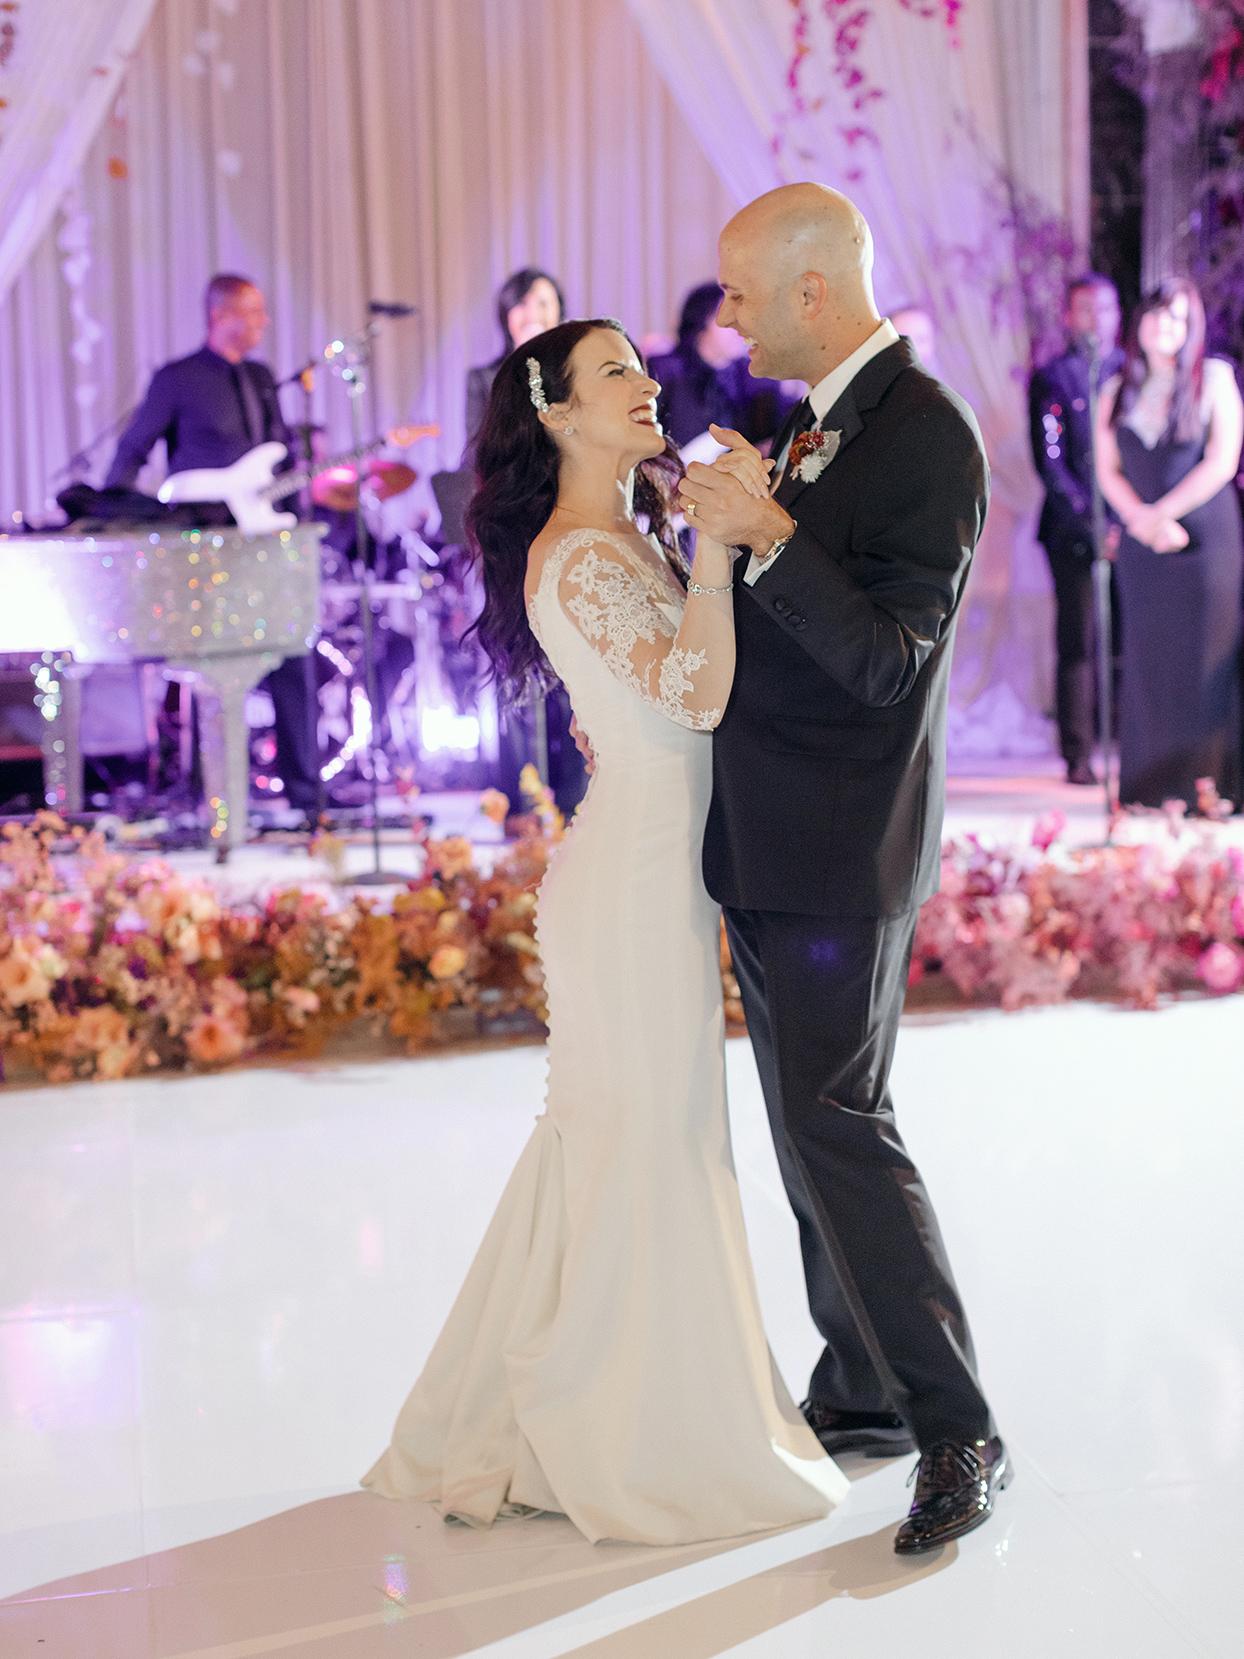 wedding couple first dance in ballroom under purple lights